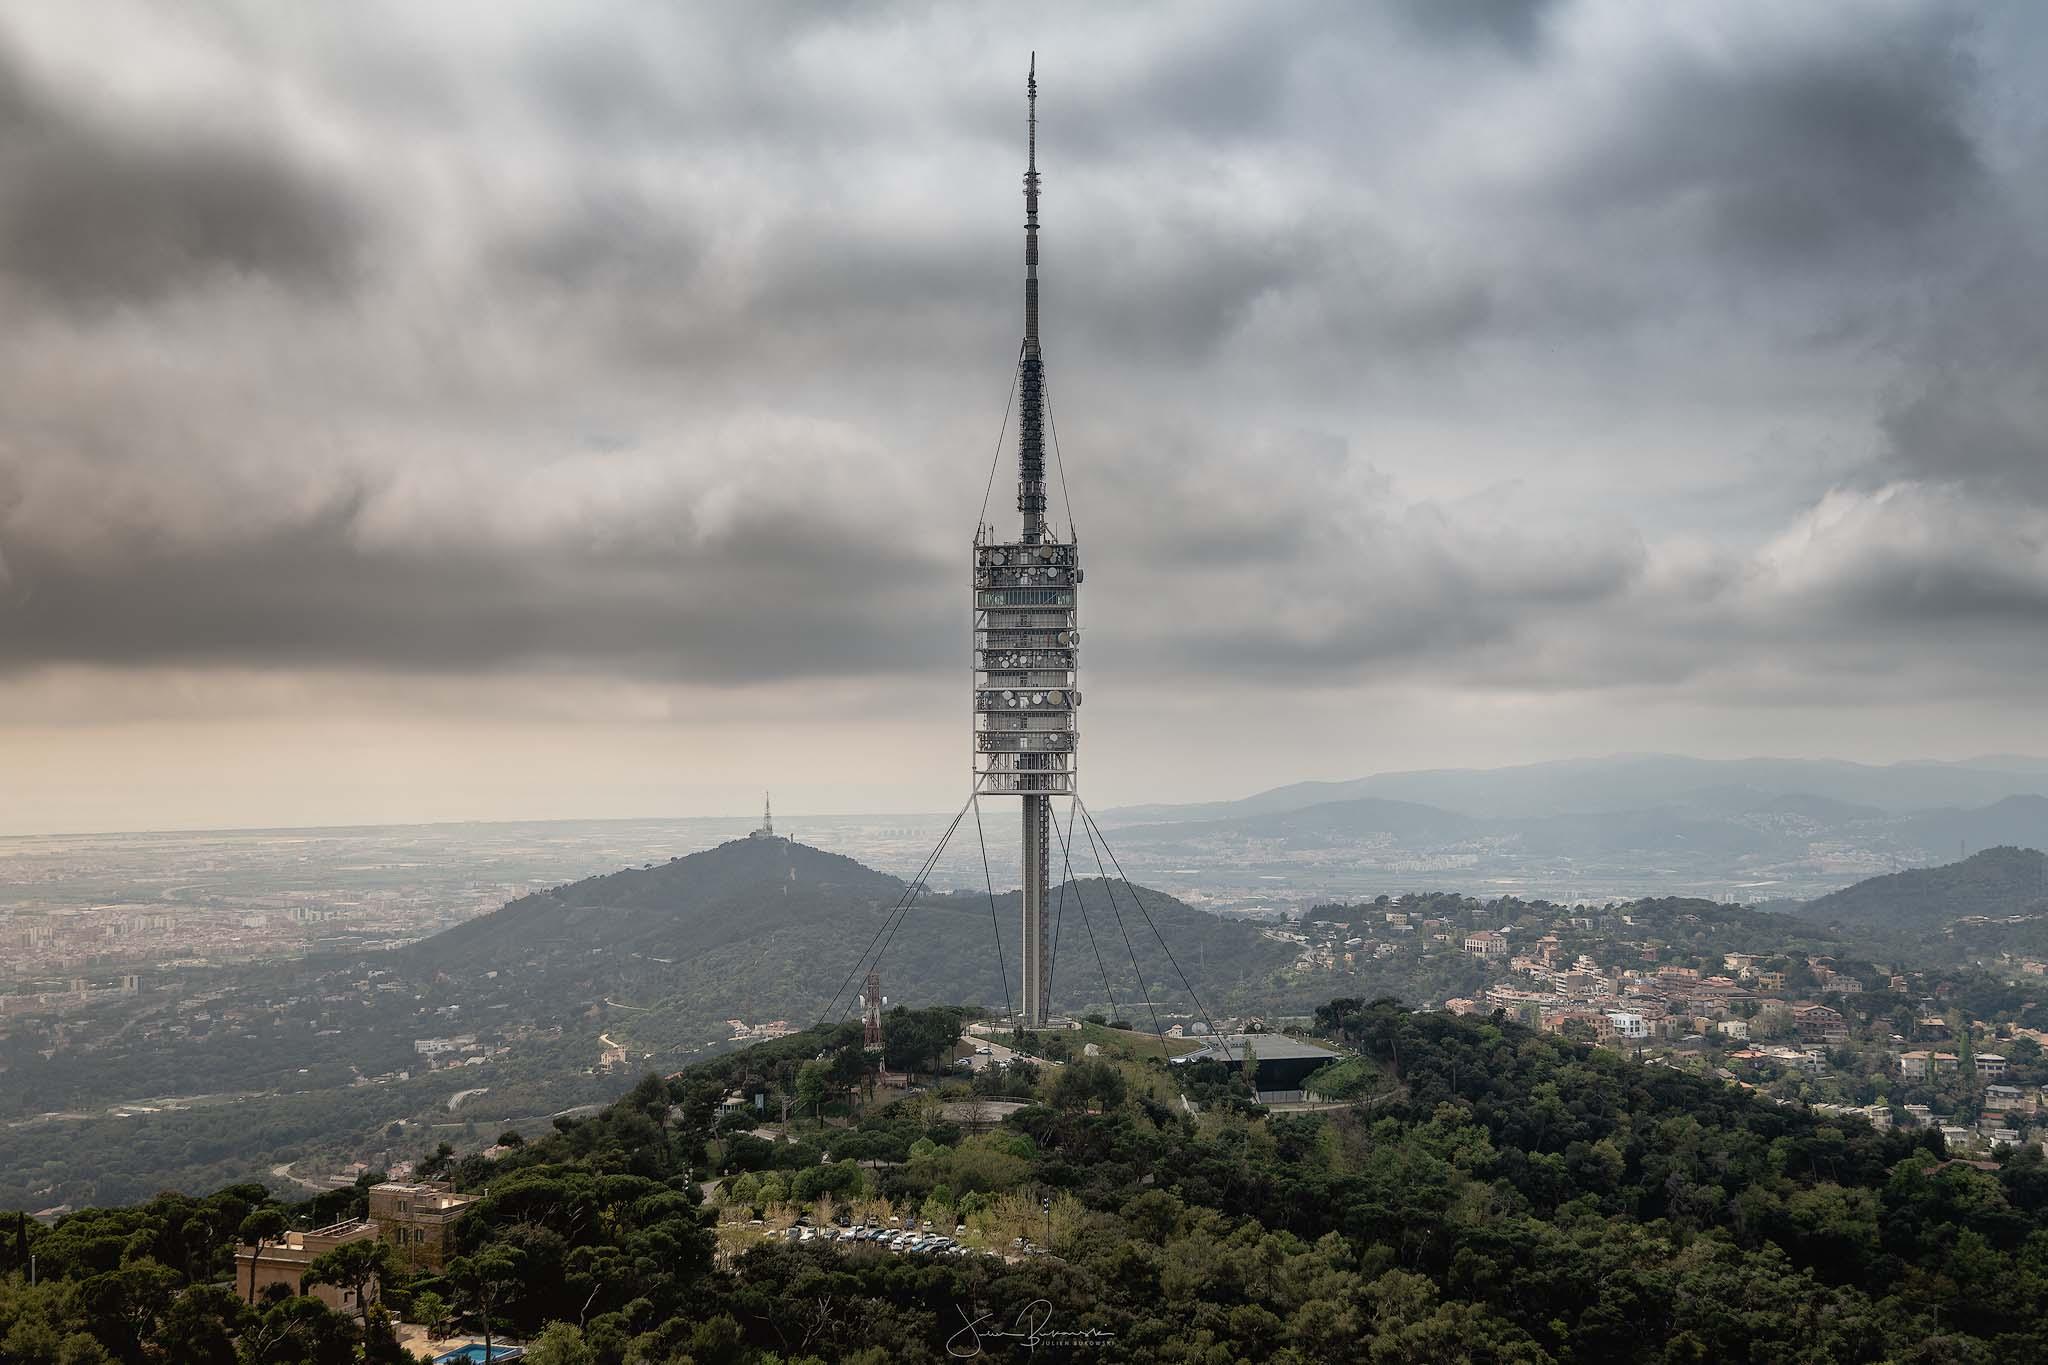 Torre de Collserola (Barcelone - Espagne)